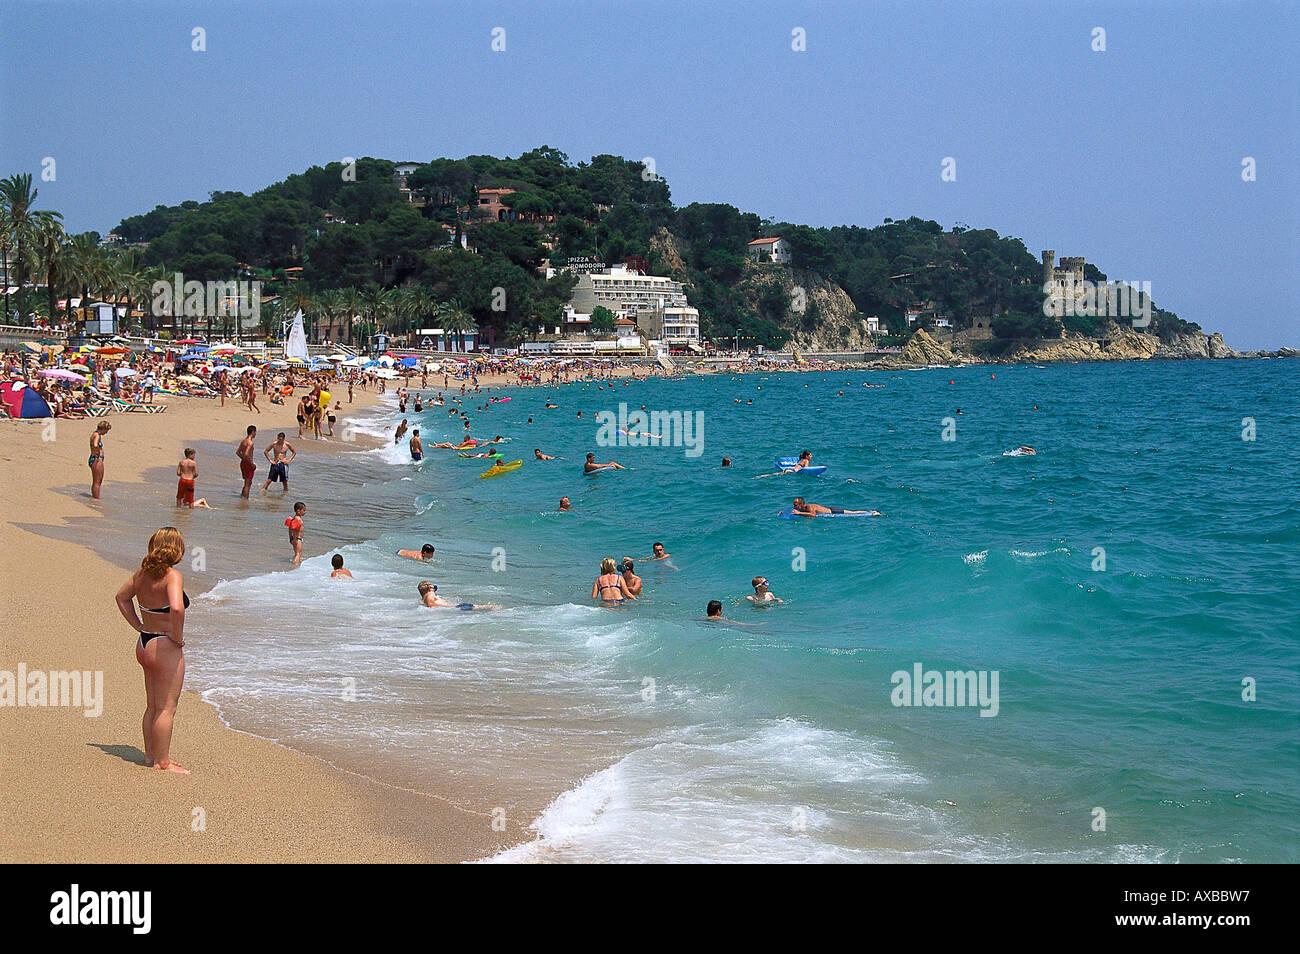 people on the beach in the sunlight lloret de mar costa brava stock photo 9594838 alamy. Black Bedroom Furniture Sets. Home Design Ideas